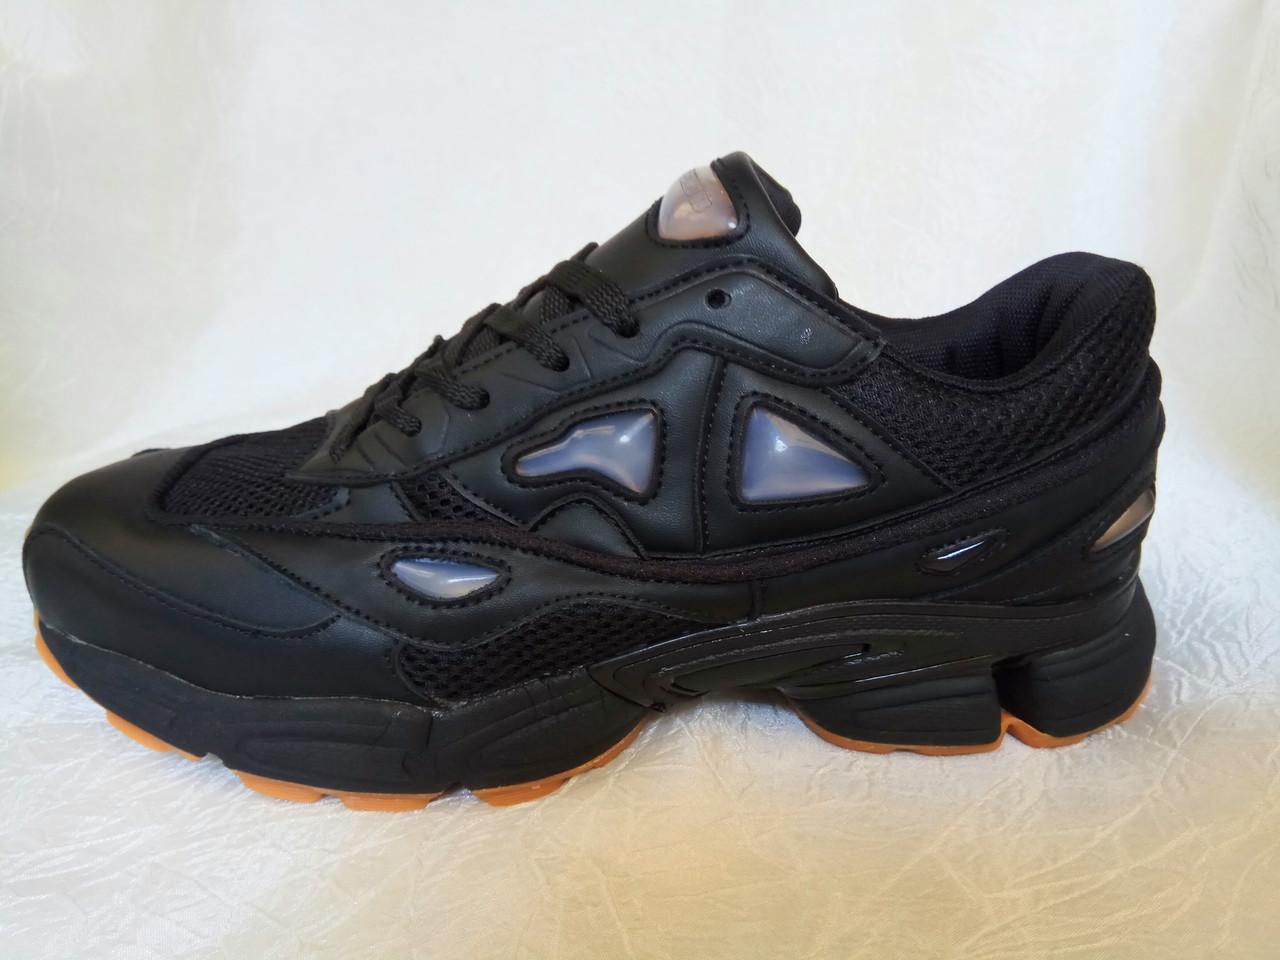 ab04d170 Adidas Raf Simons Ozweego 2 мужские кроссовки черные - Интернет магазин  krossovkiweb.kiev.ua